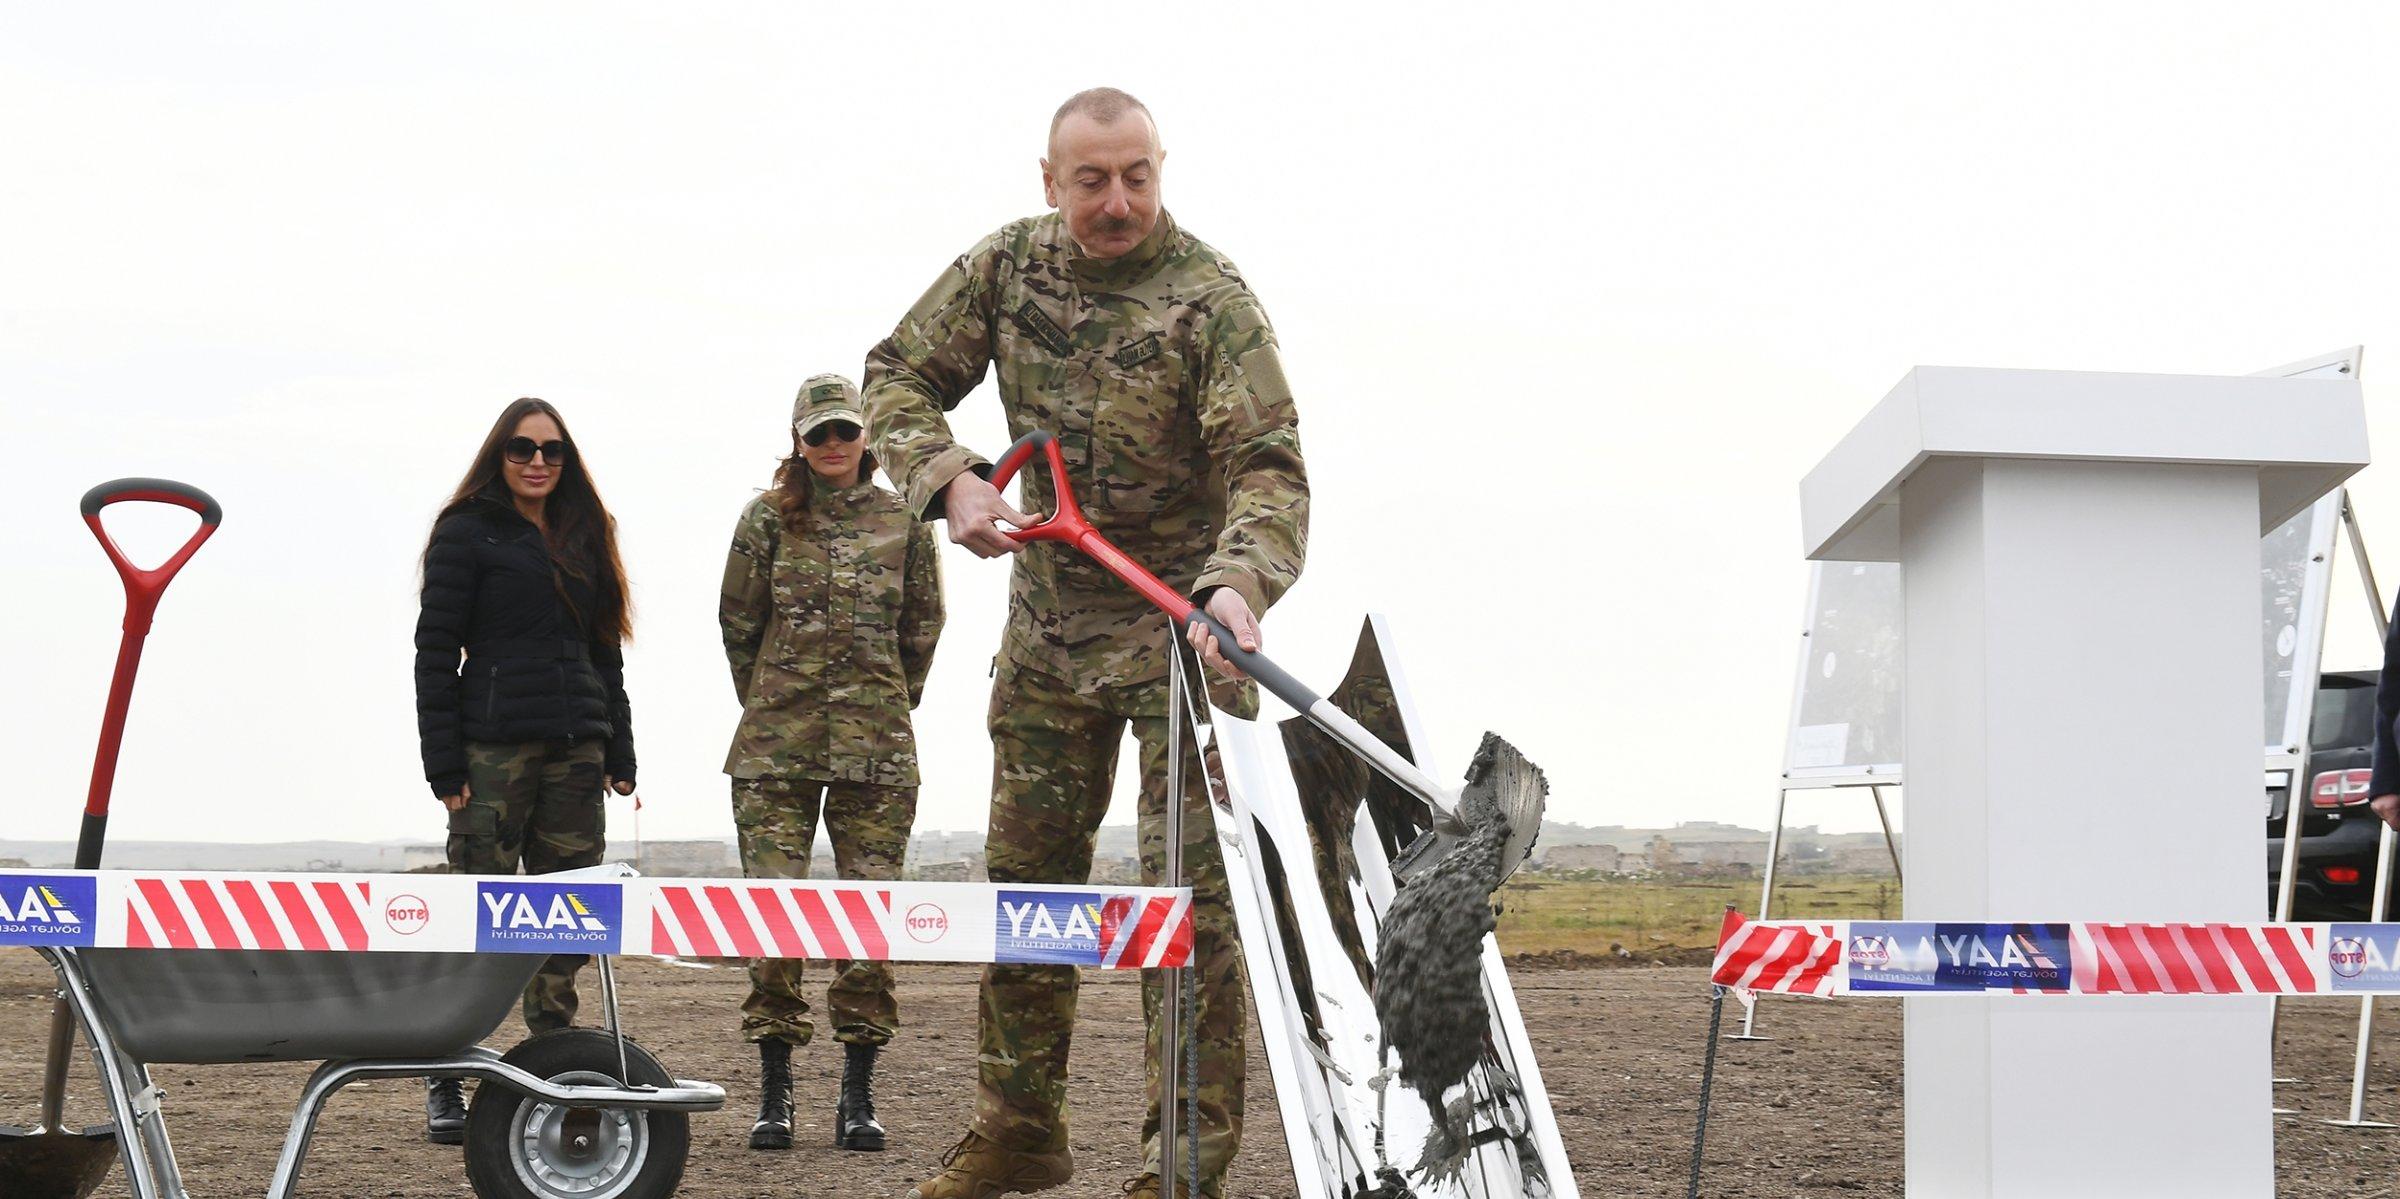 Azerbaijan starts construction of new airport in liberated Karabakh